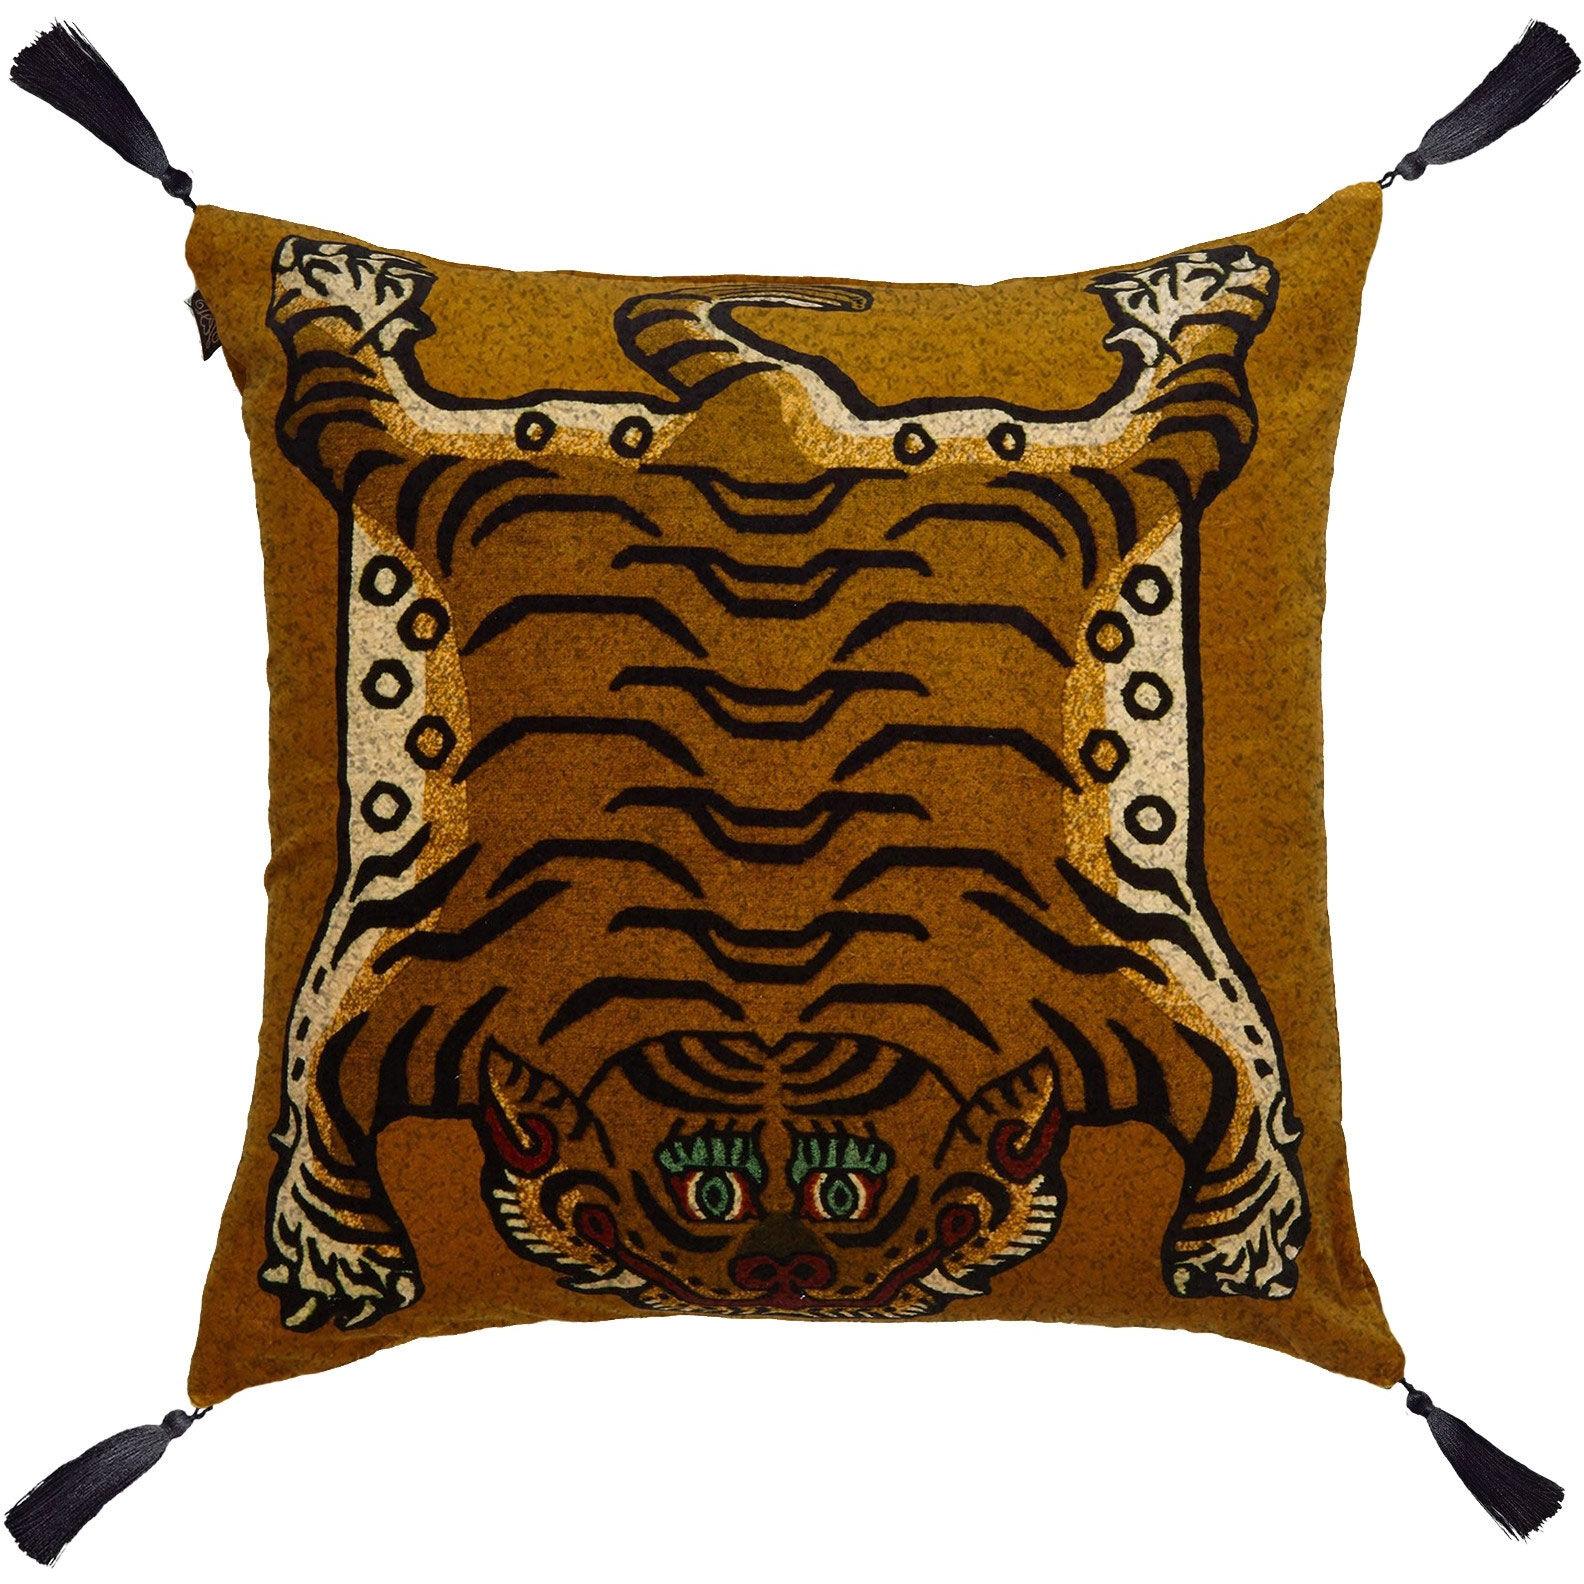 House of Hackney Saber Cushion Large, Gold